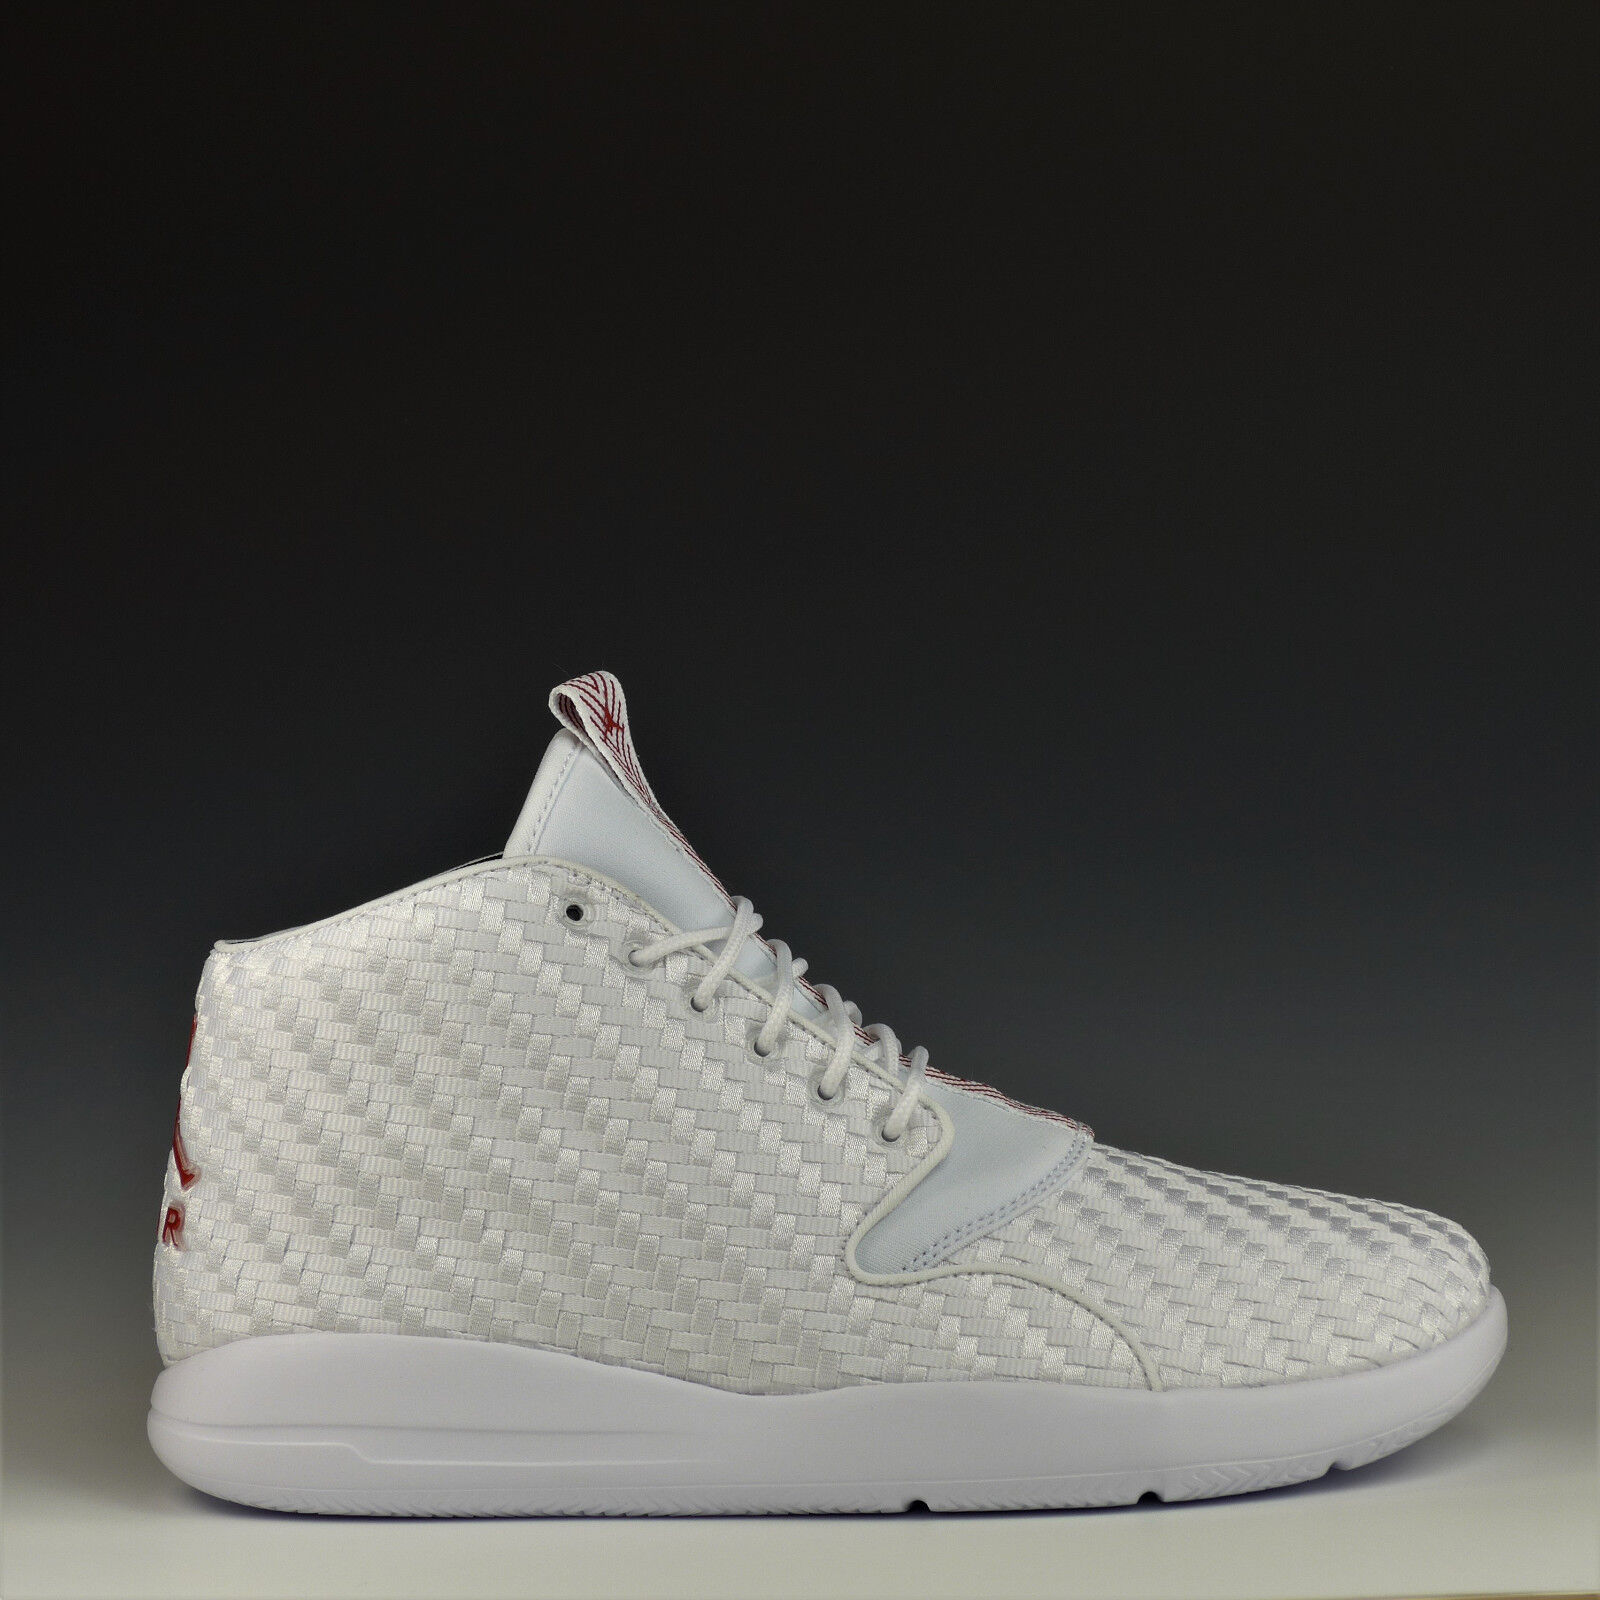 Nike Jordan Eclipse Chukka 881453101 Scarpa Da Basket Casual Lifestyle